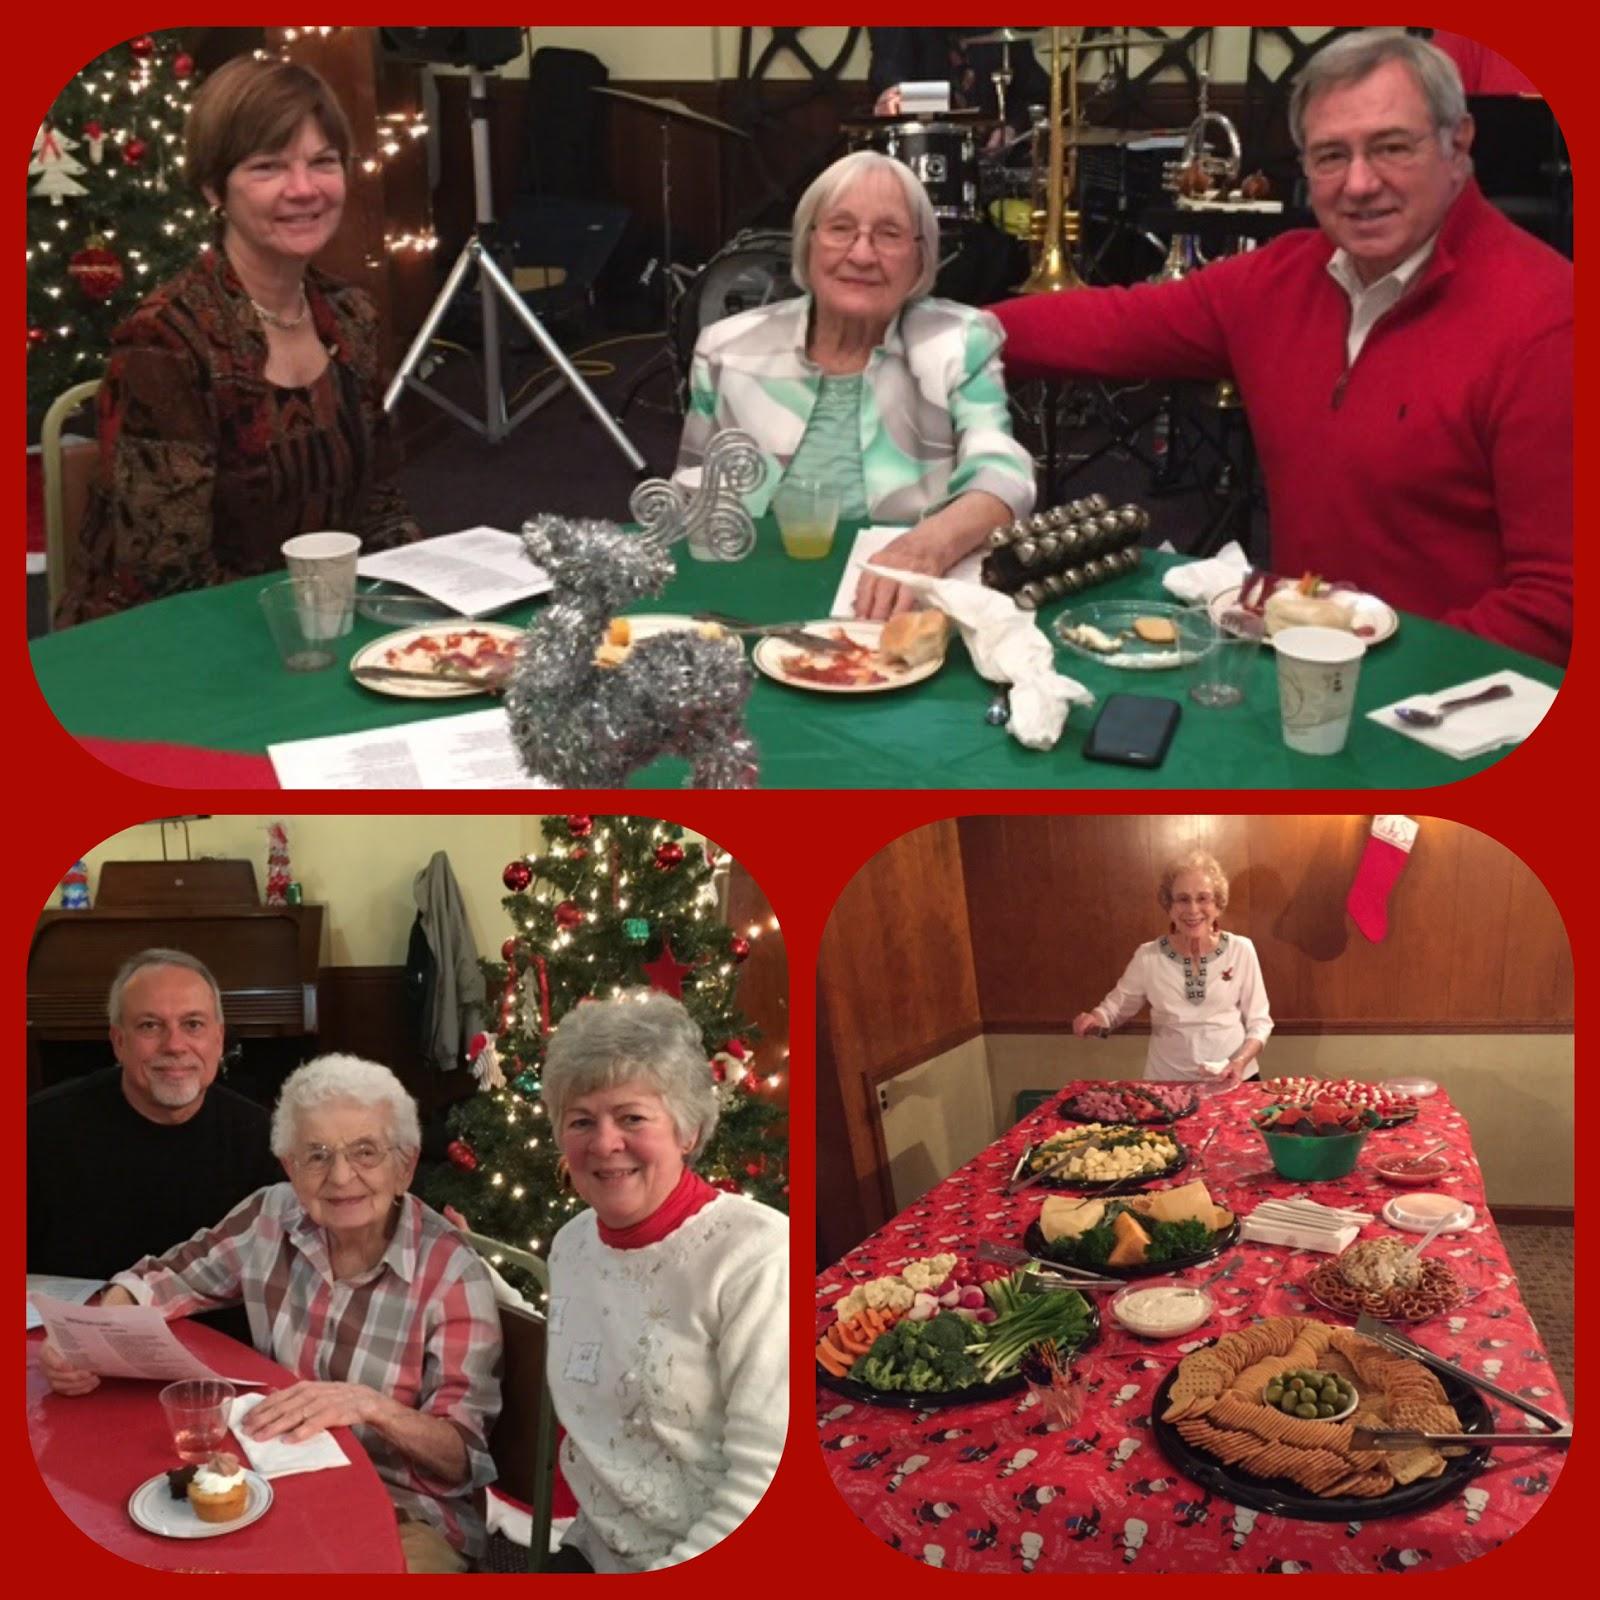 Brc Holiday Celebration Photos 2015: Juniper Village At Meadville: Alive In All Seasons